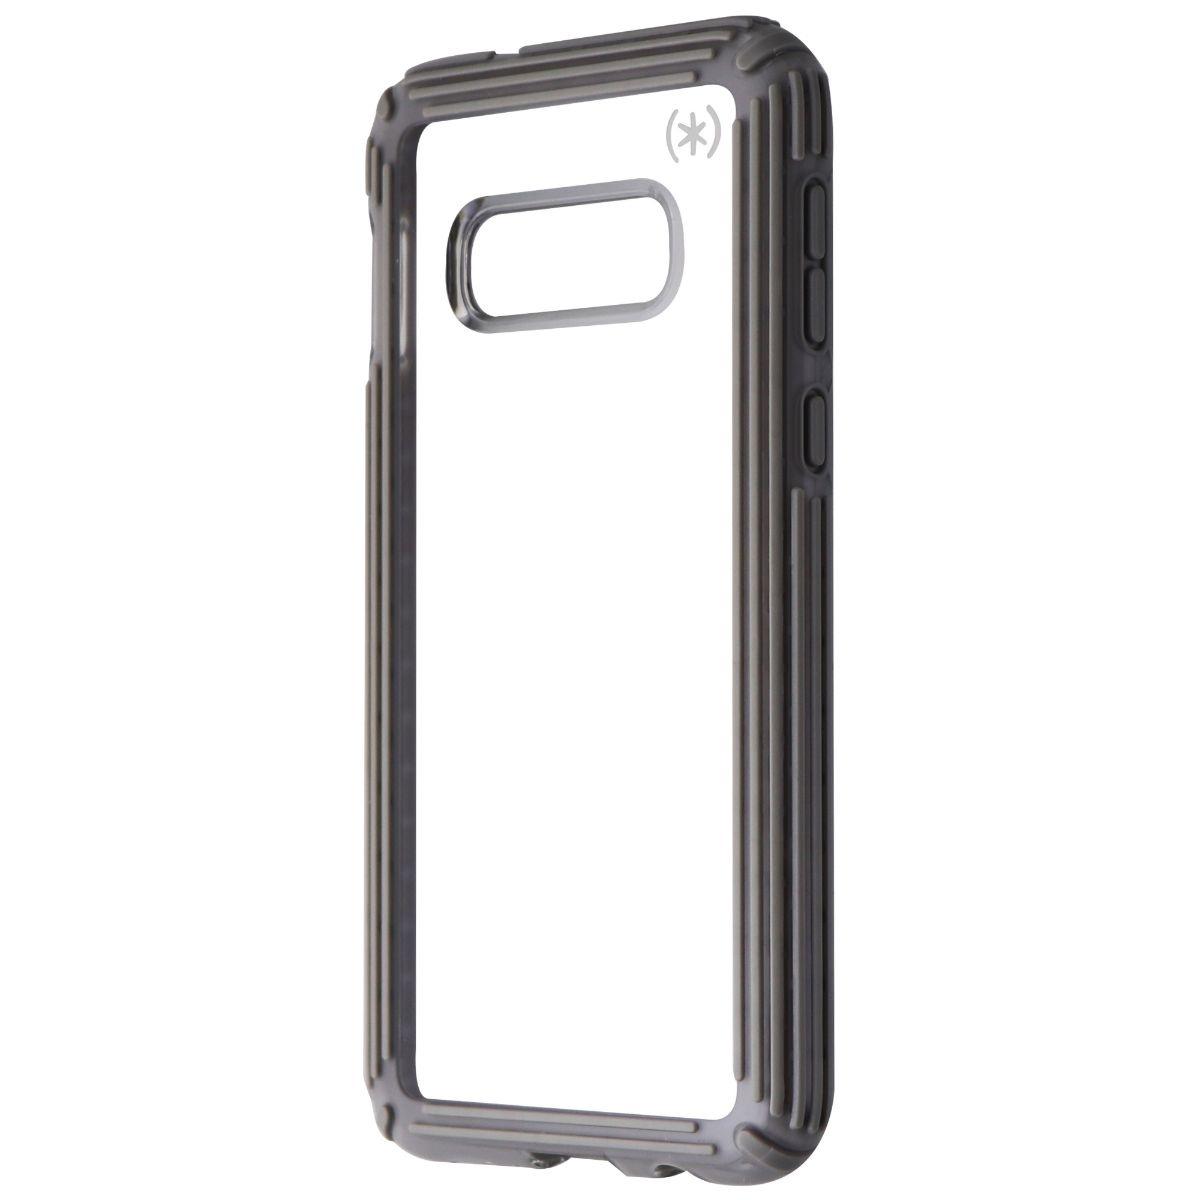 Speck Presidio V-Grip Series Case for Samsung Galaxy S10e - Clear / Gray